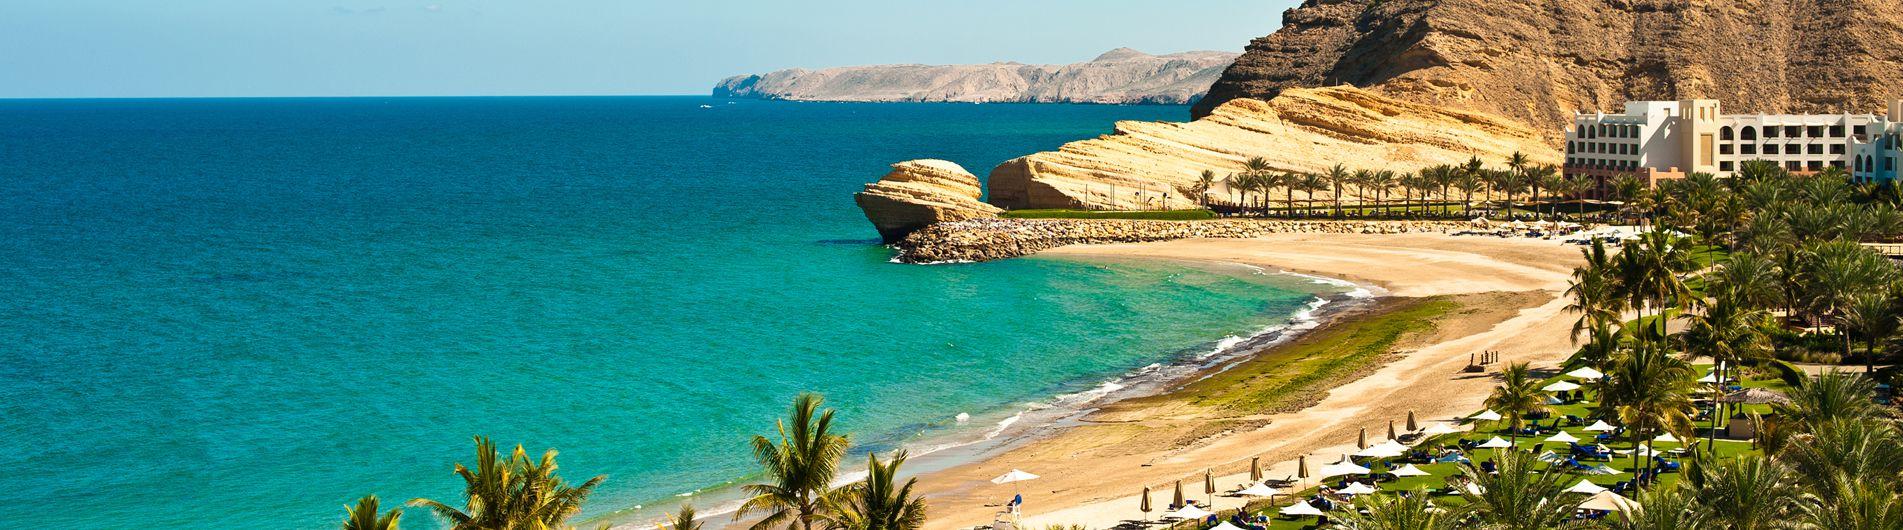 Oman Beach Holidays